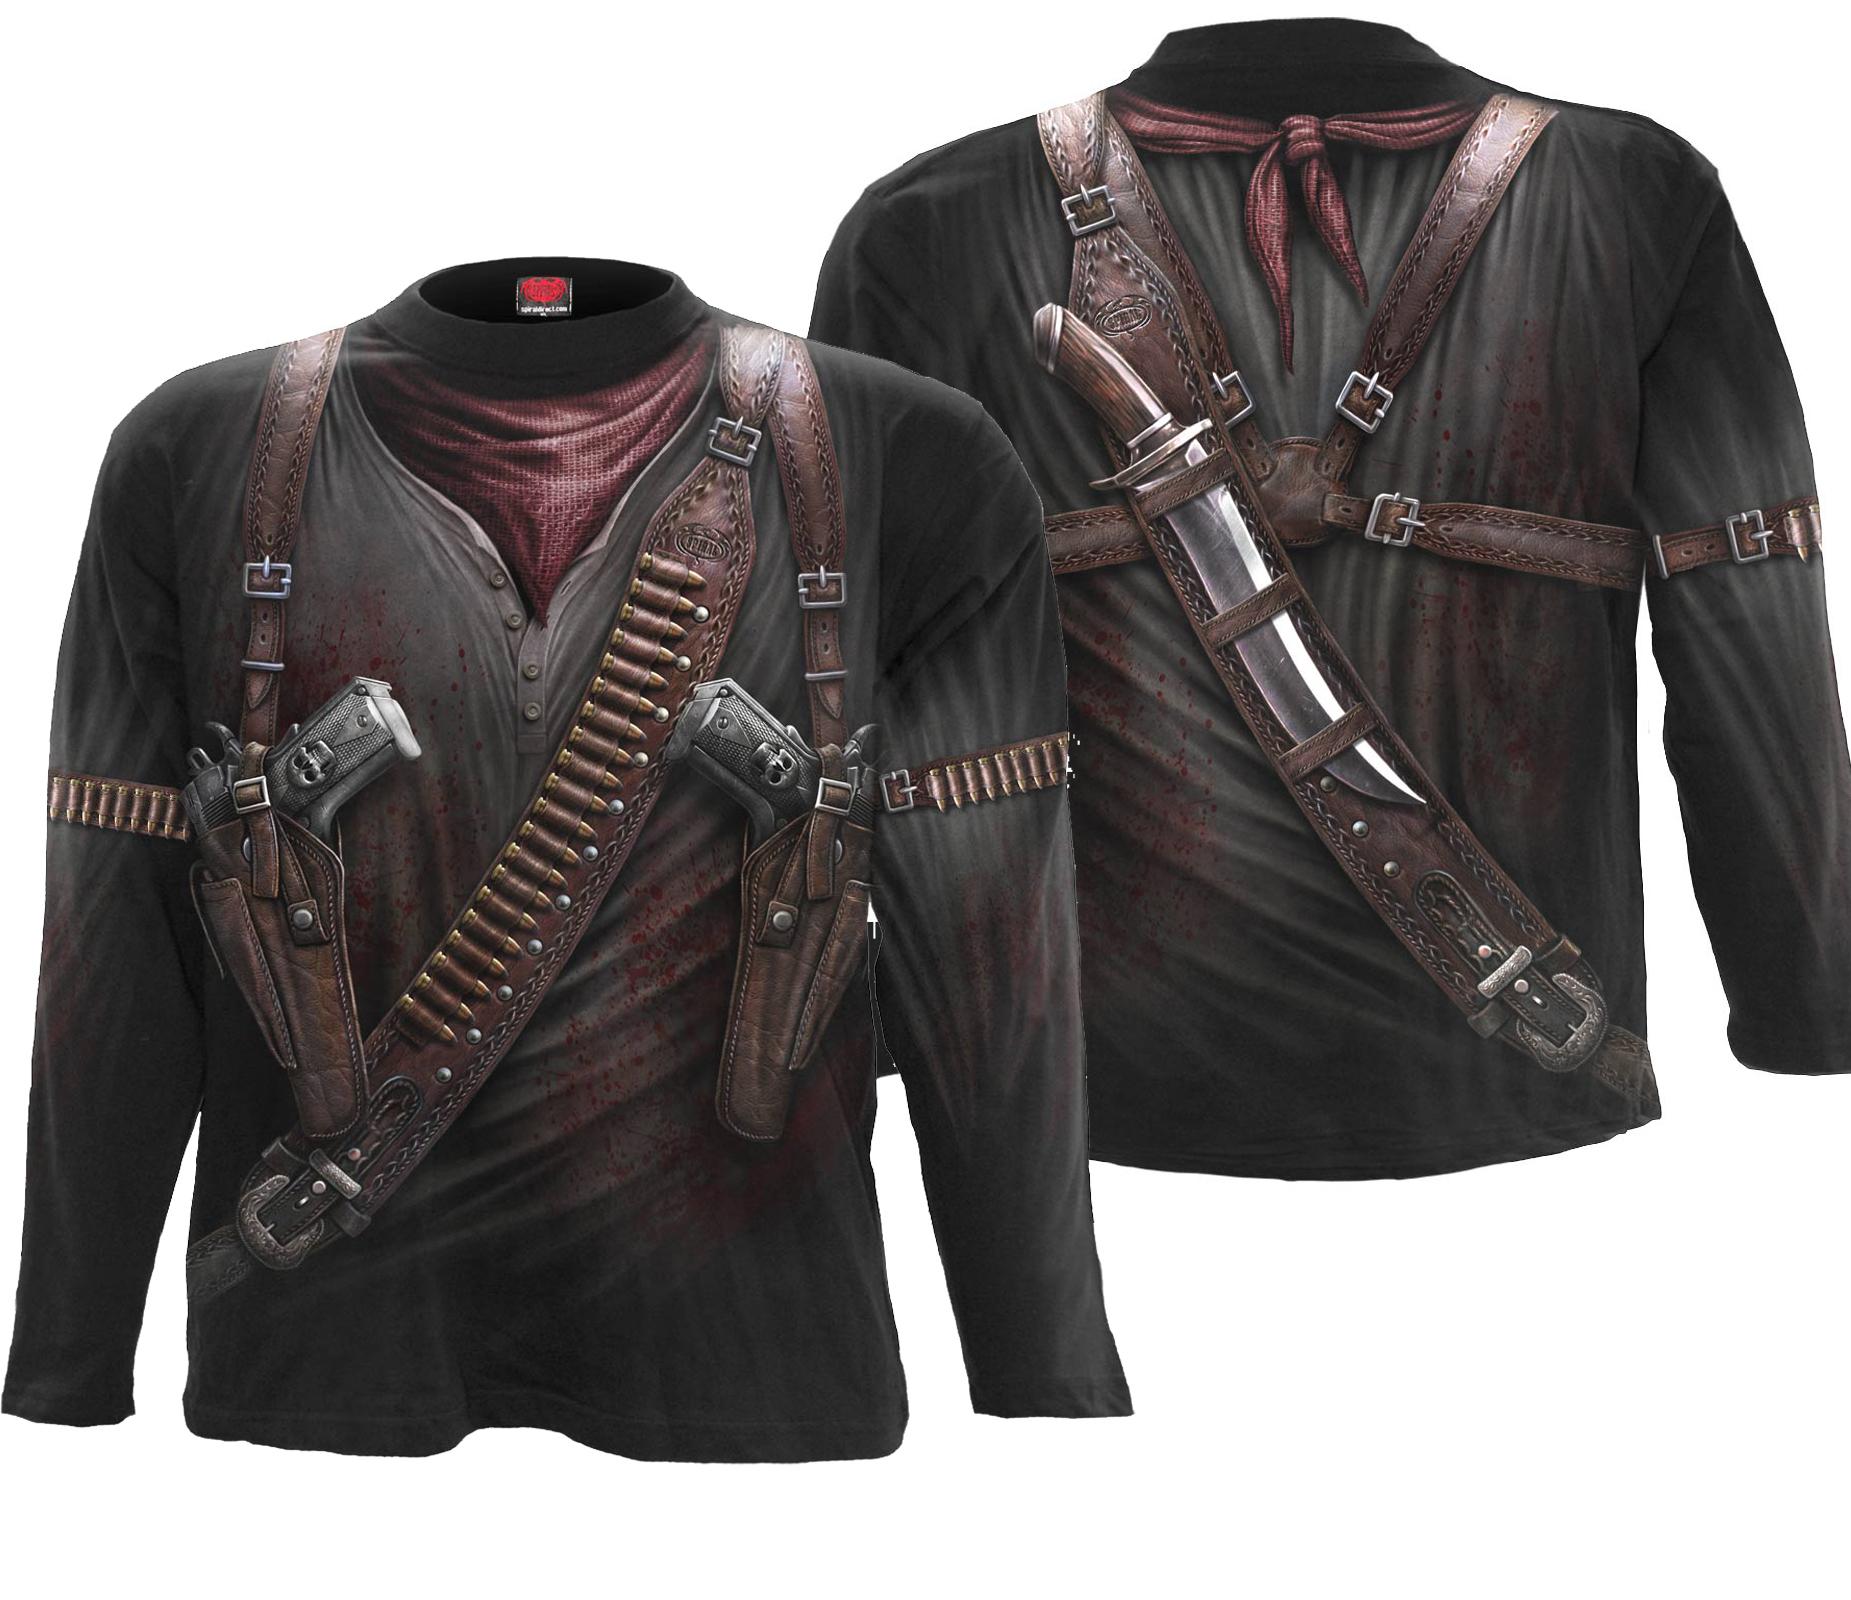 SPIRAL Holster Wrap Langarm Shirt Rundumdruck W022M304